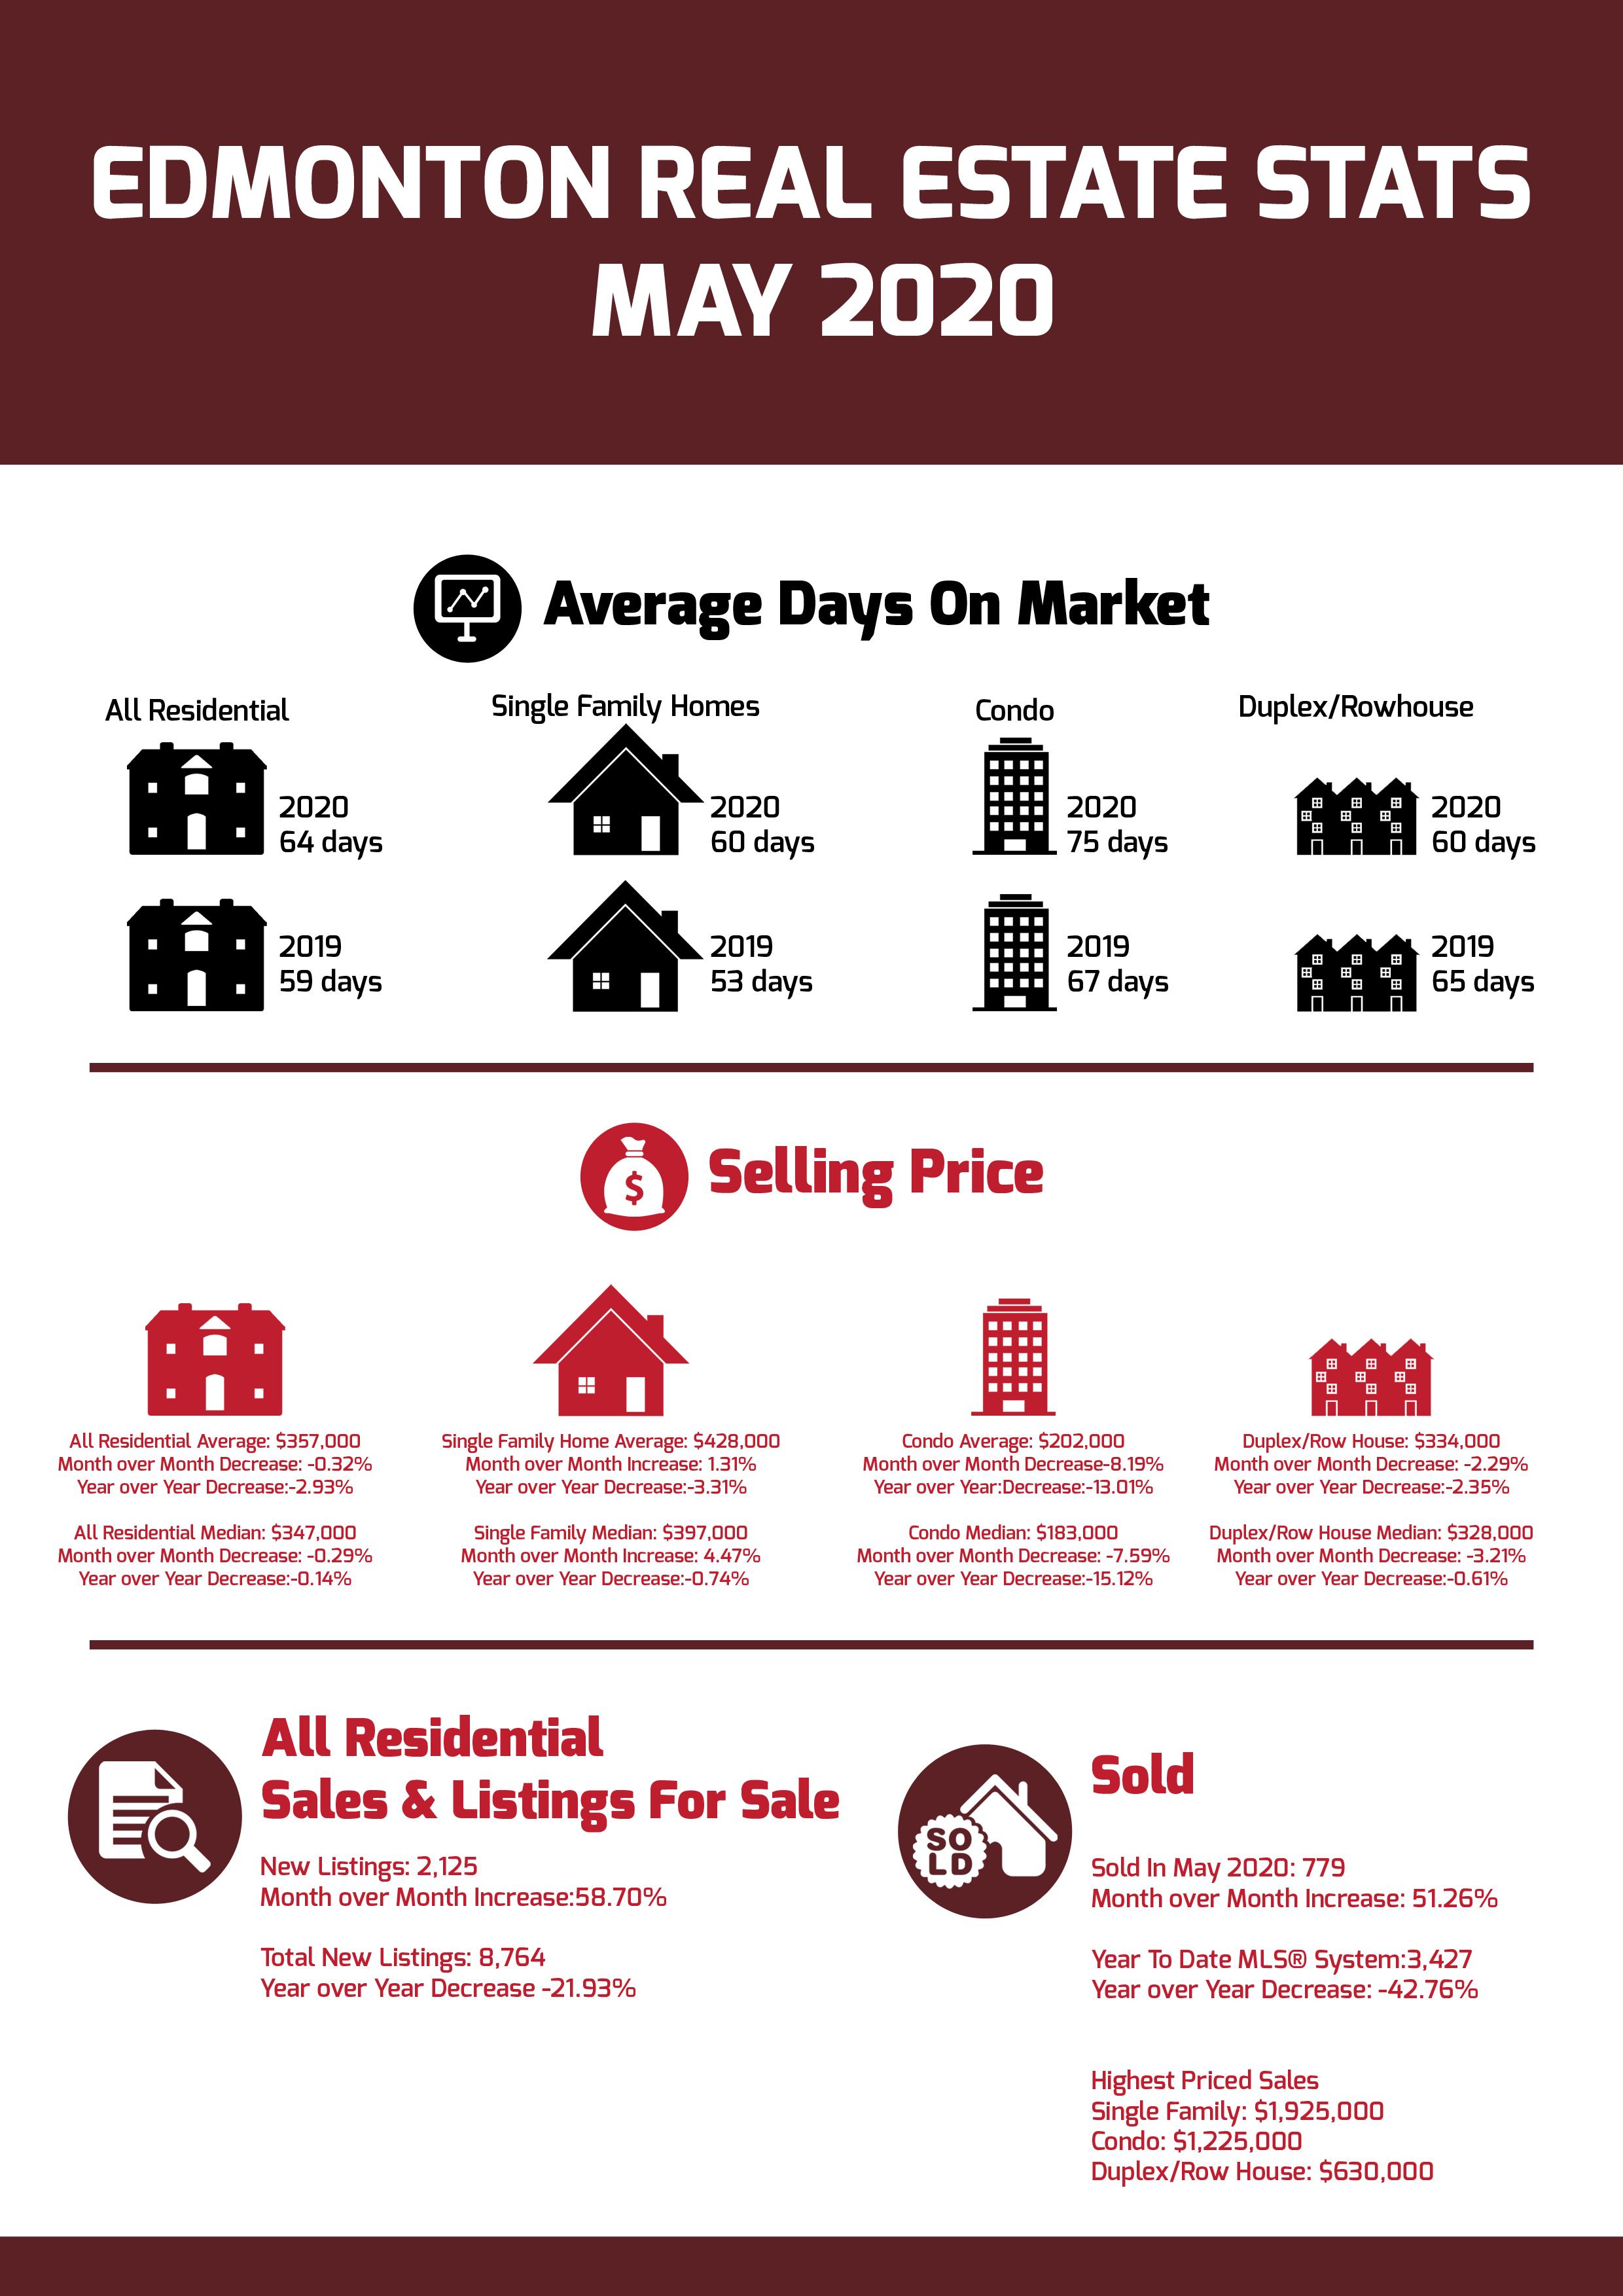 Edmonton Real Estate Stats May 2020